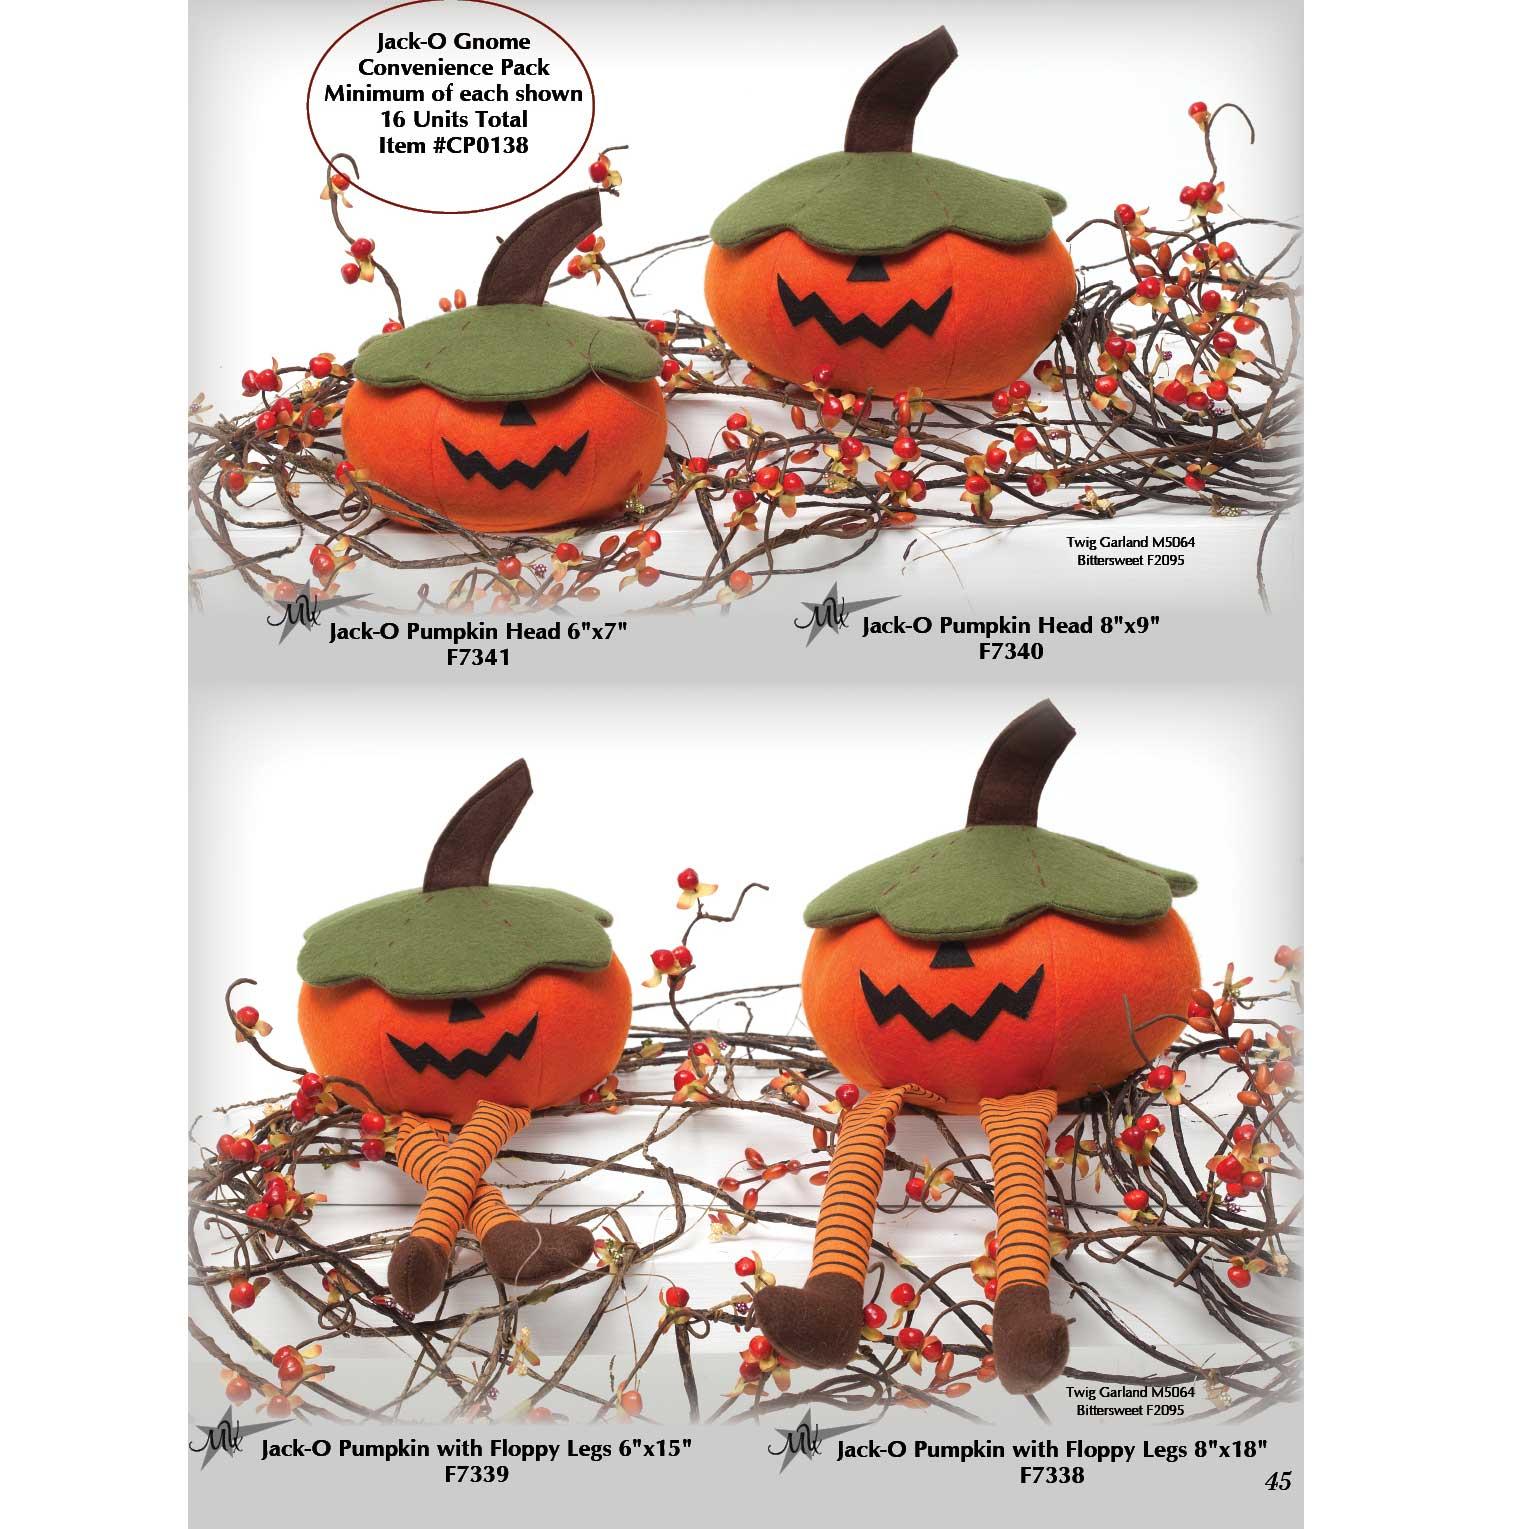 Jack-O Pumpkin Convenience Pack